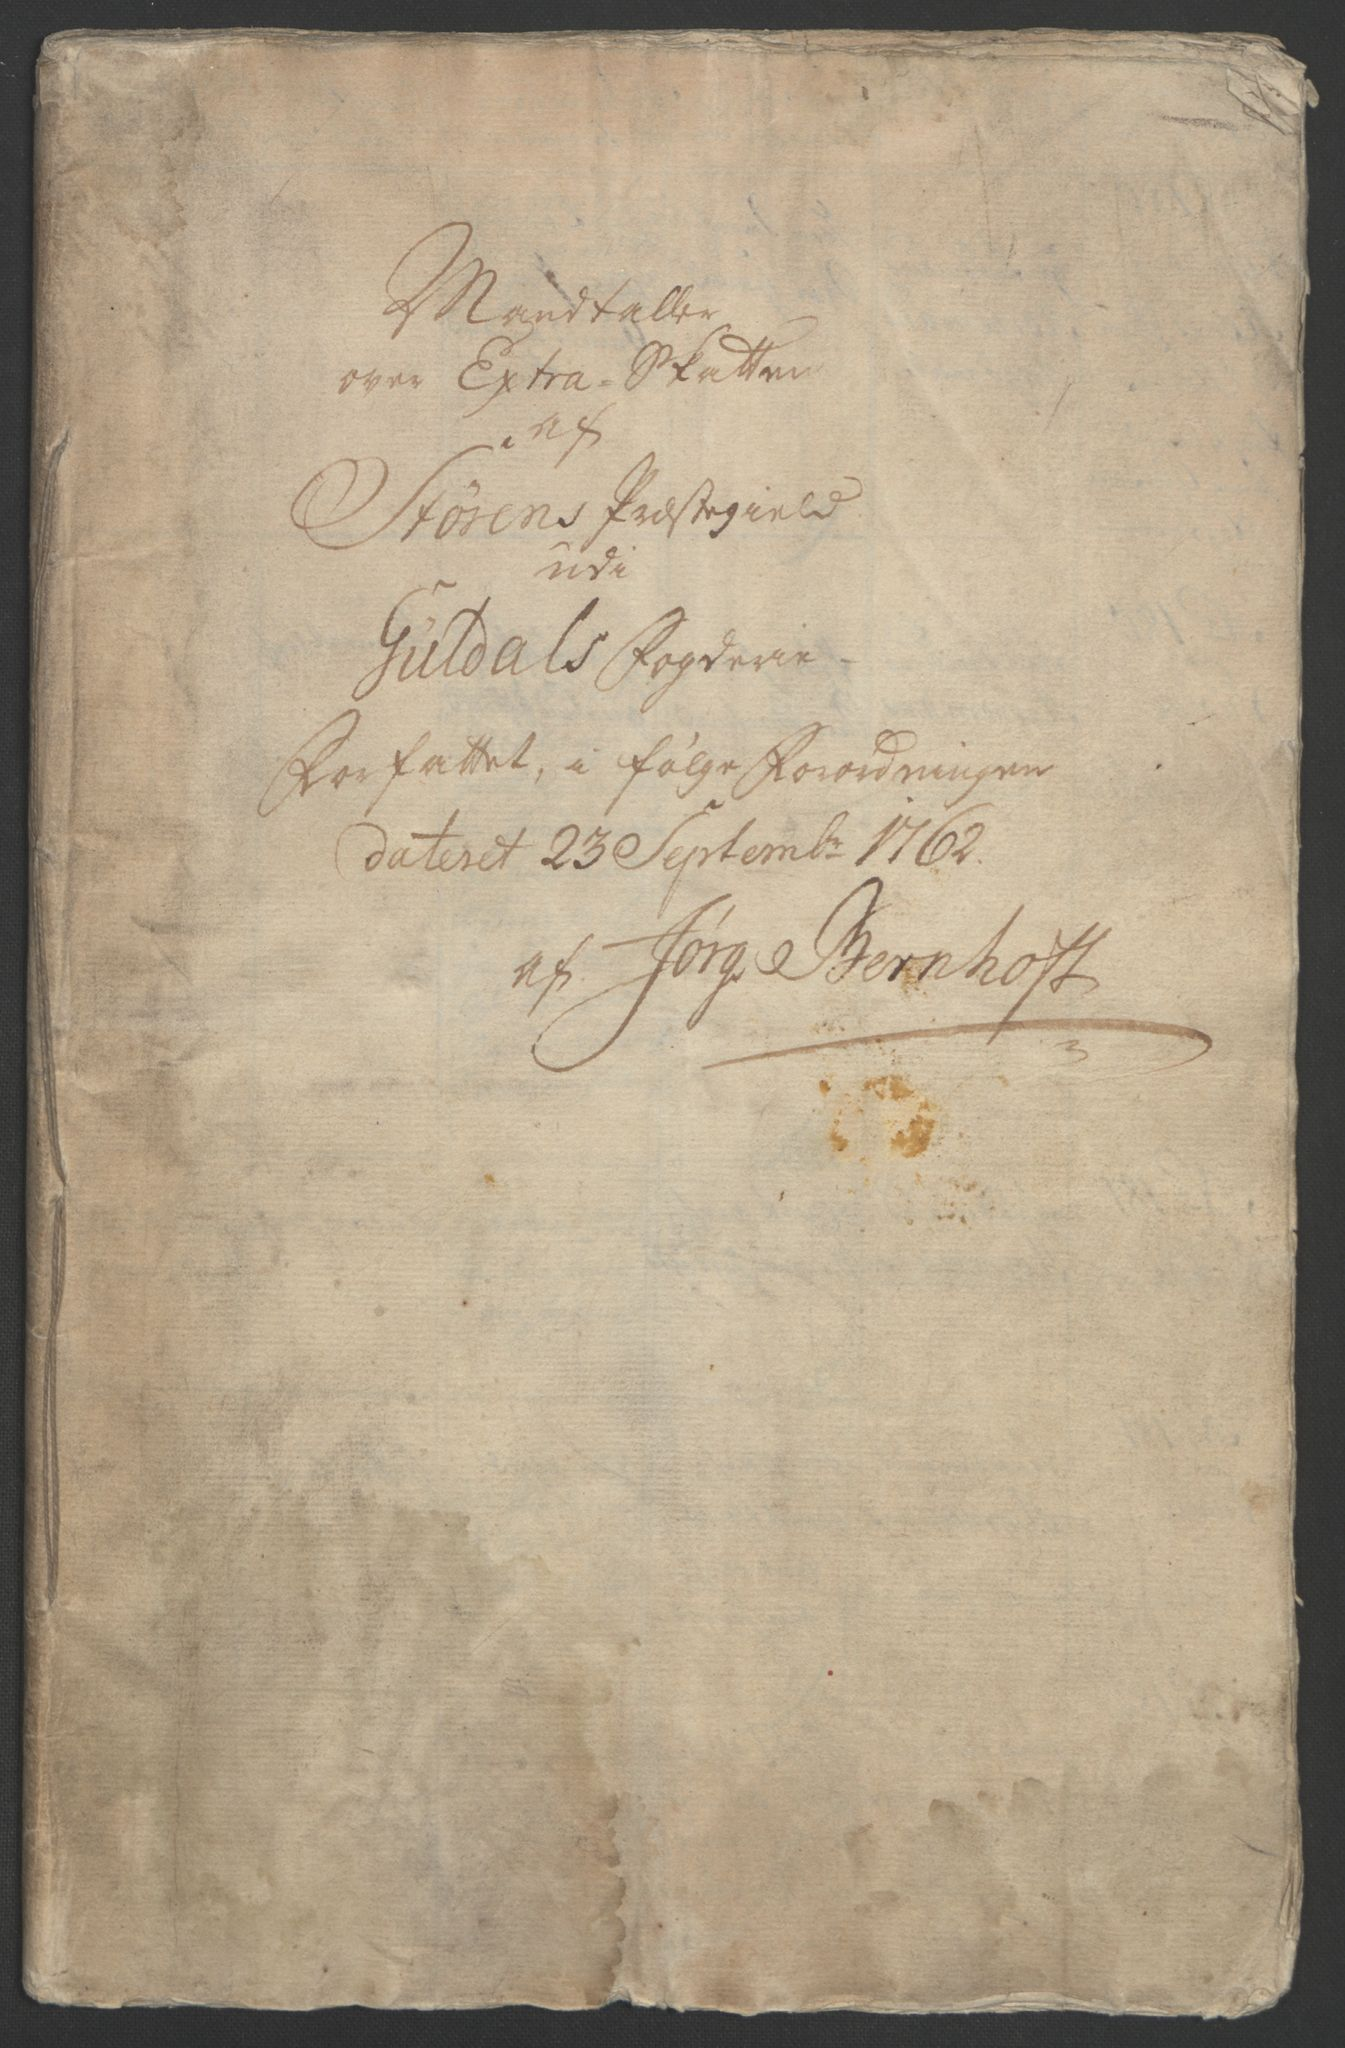 RA, Rentekammeret inntil 1814, Realistisk ordnet avdeling, Ol/L0021: [Gg 10]: Ekstraskatten, 23.09.1762. Orkdal og Gauldal, 1762-1767, s. 174